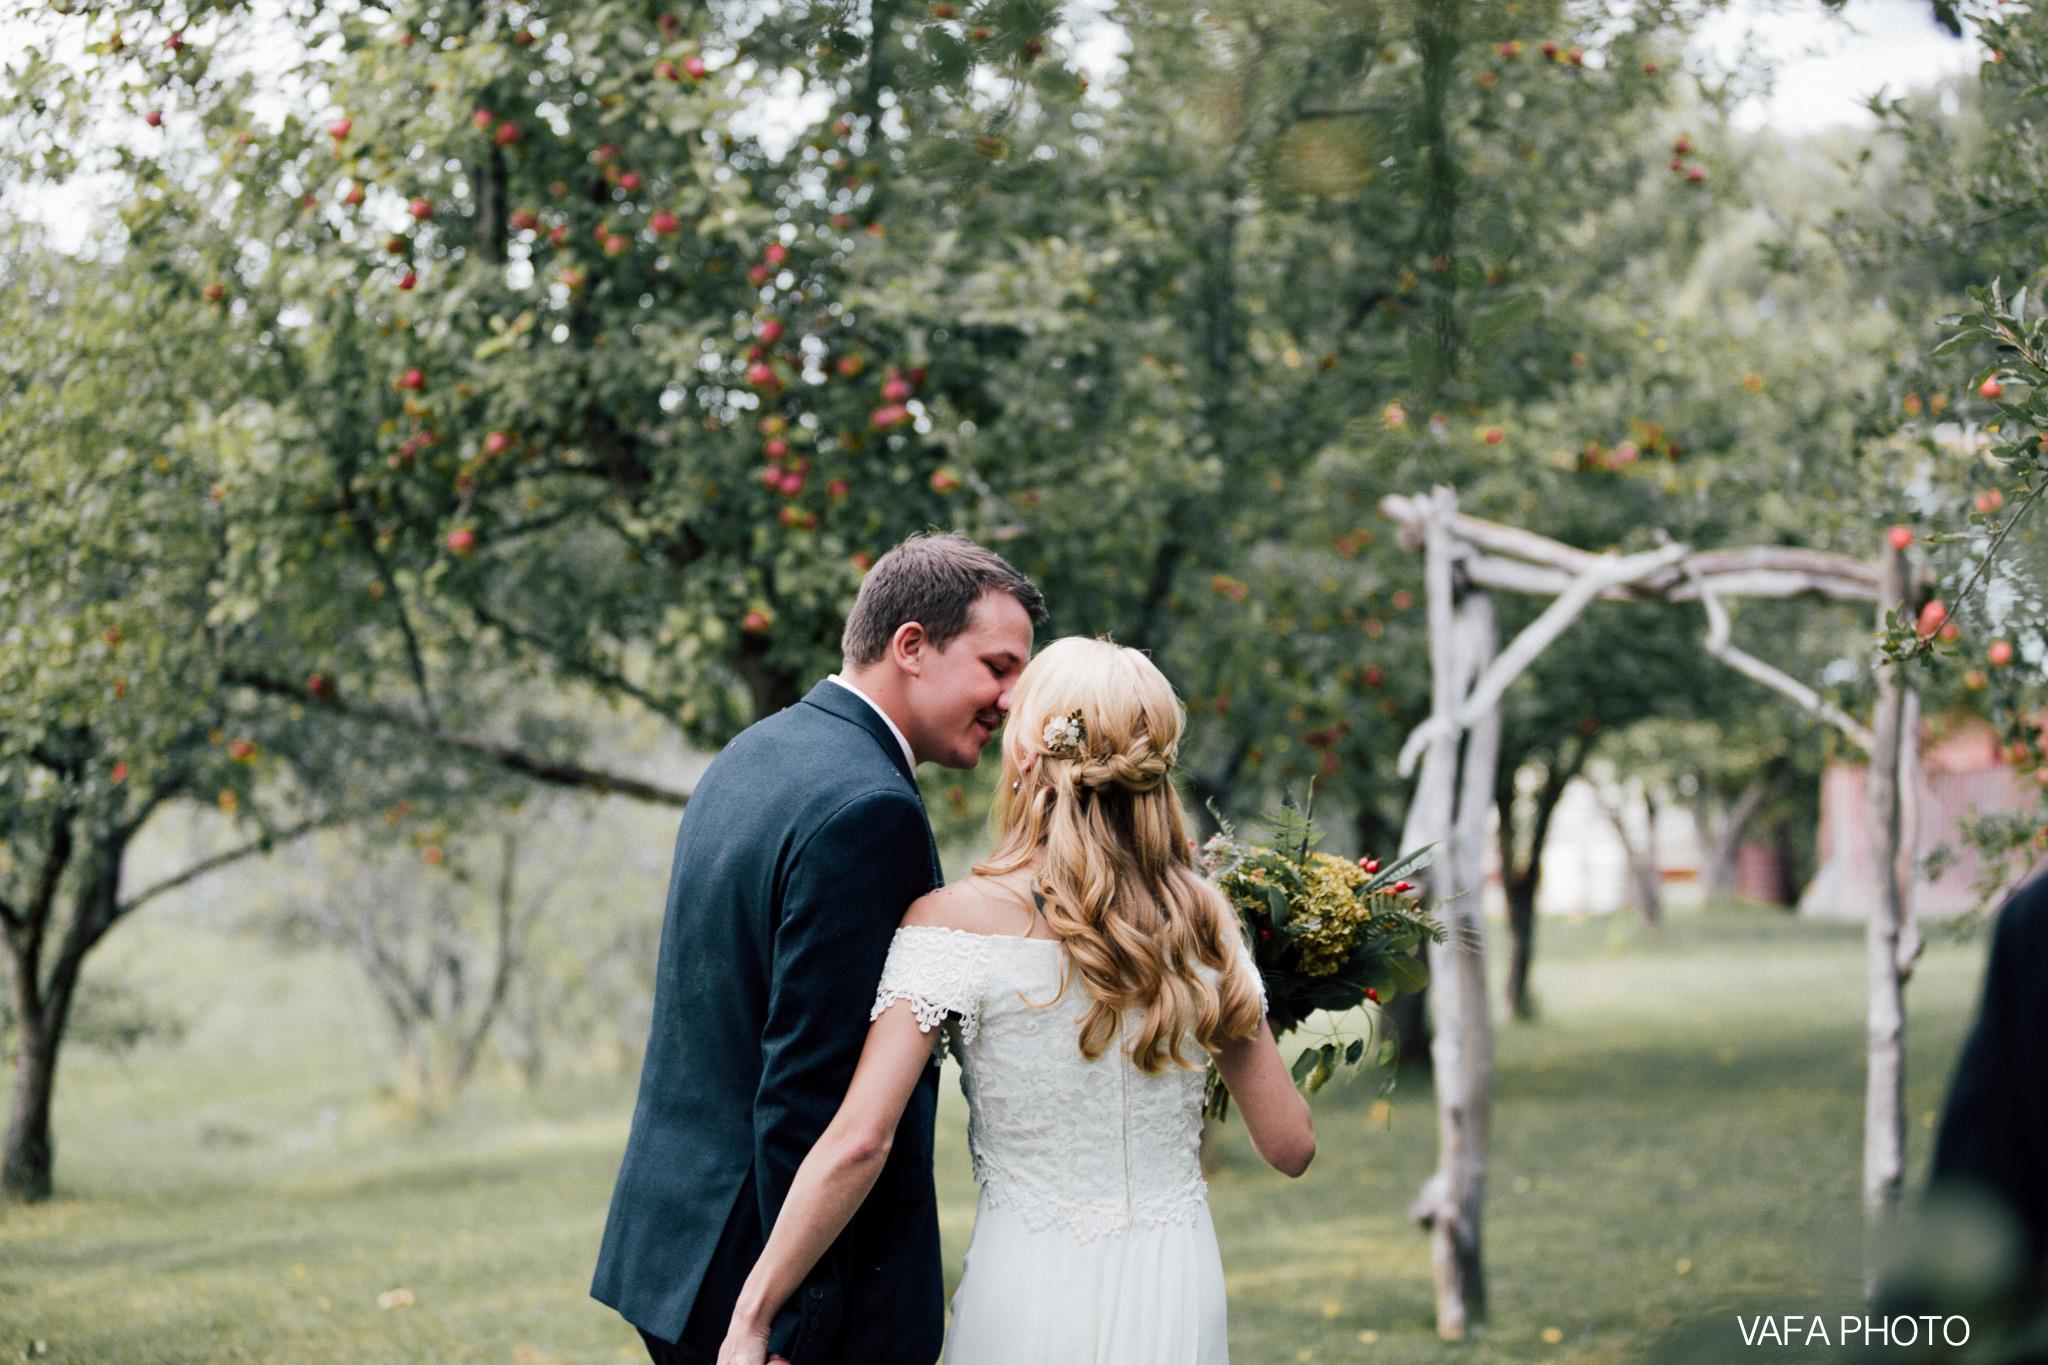 Belsolda-Farm-Wedding-Christy-Eric-Vafa-Photo-505.jpg